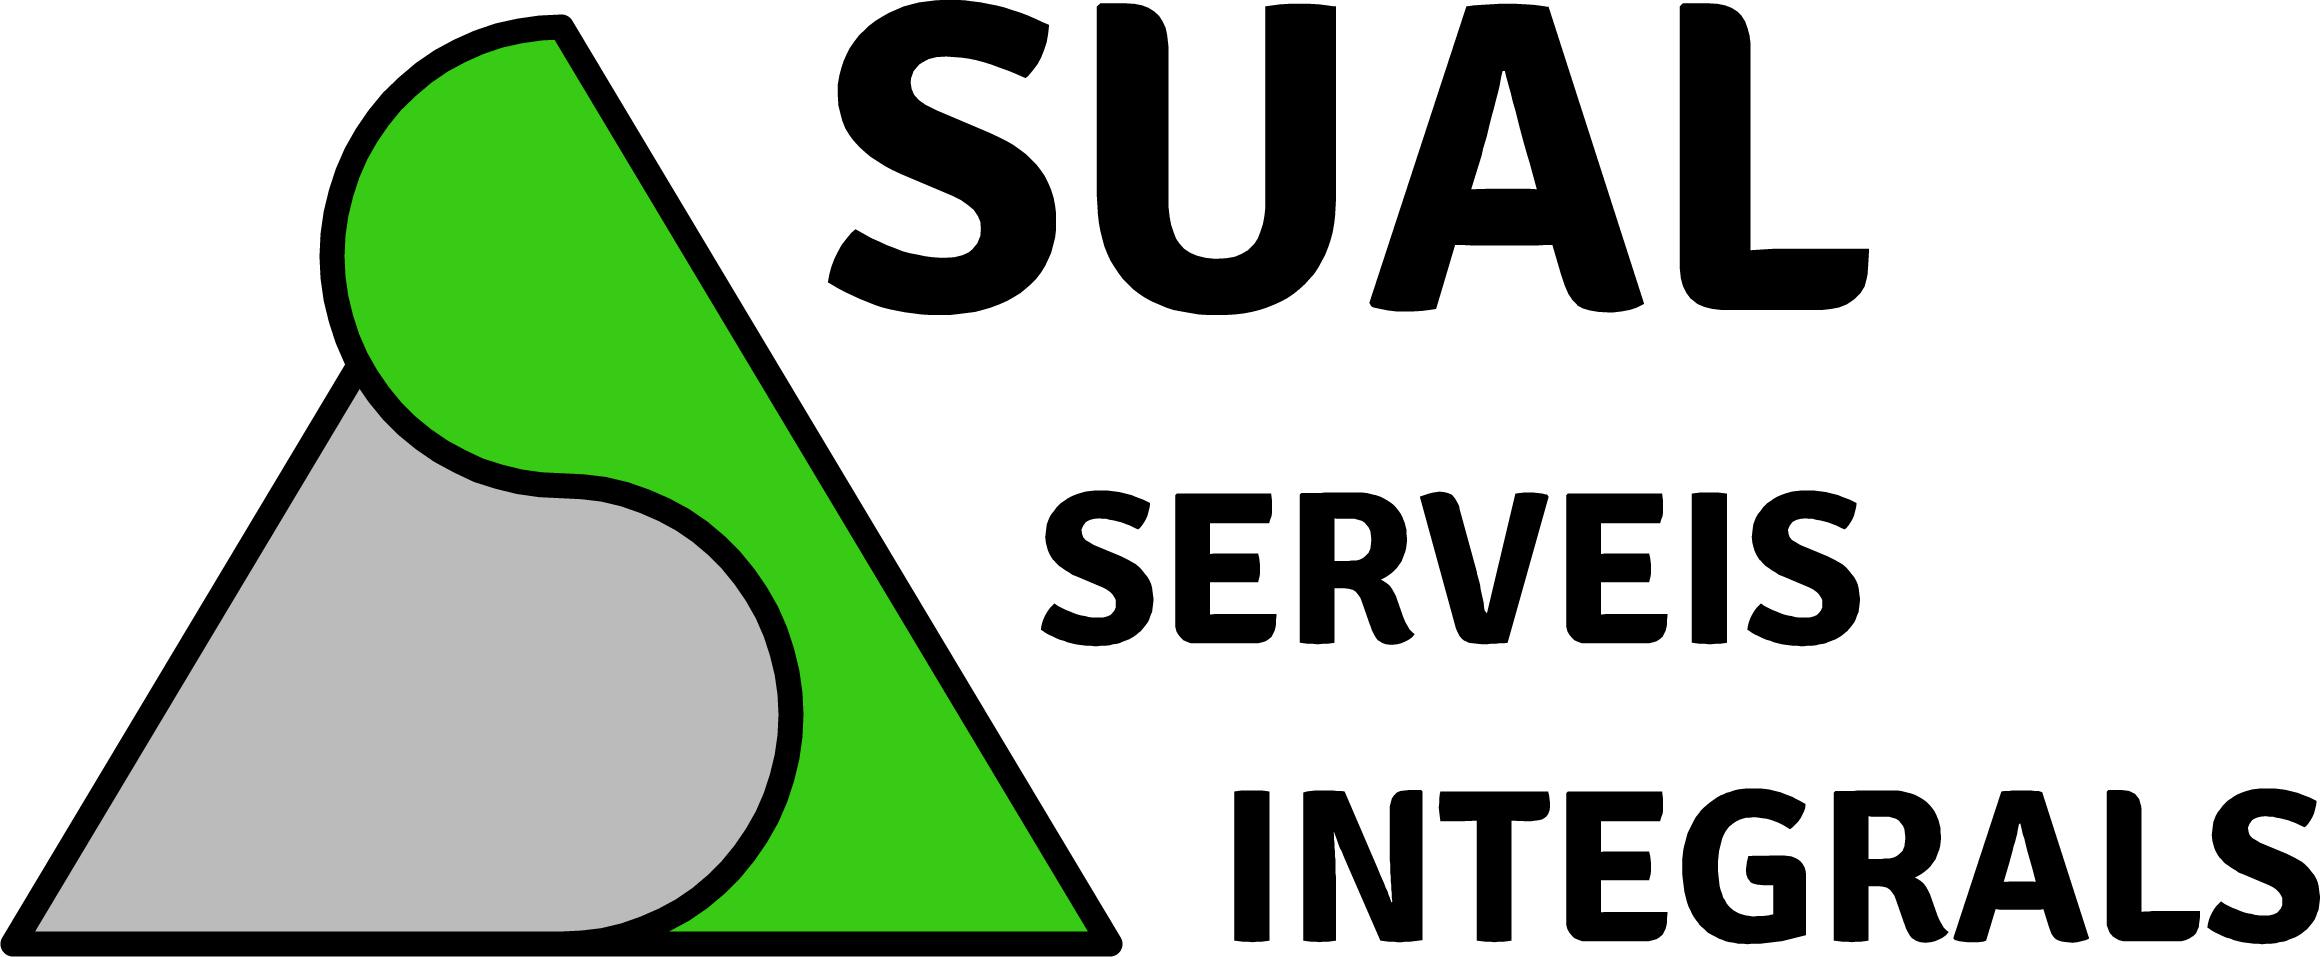 Sual Serveis Integrals, S.l.